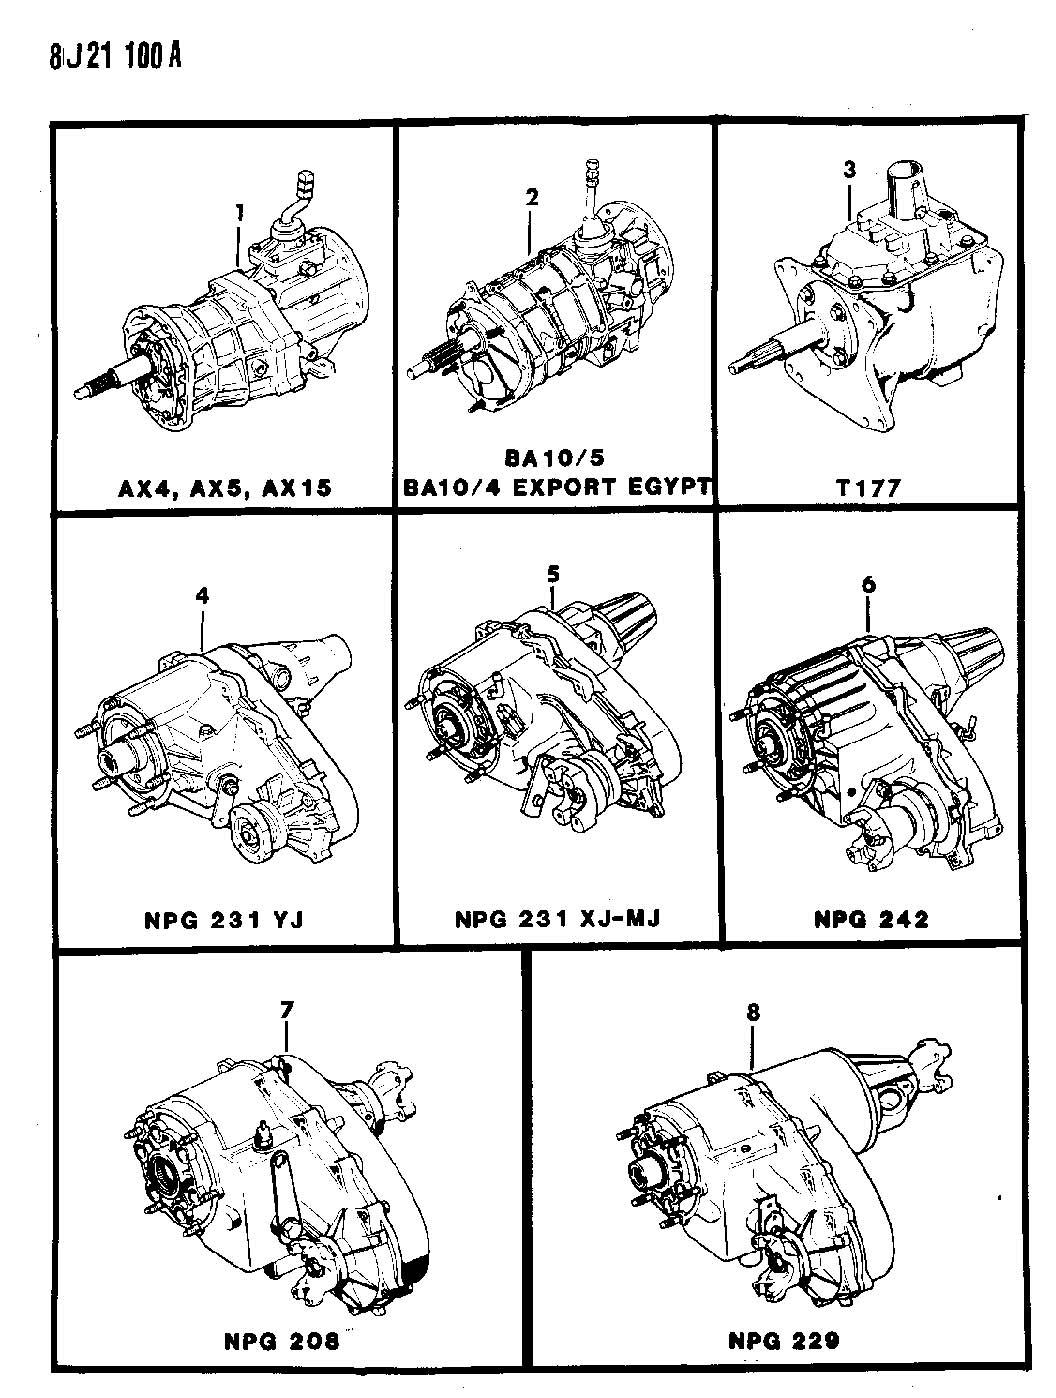 Jeep Comanche Manual Transmission And Transfer Case